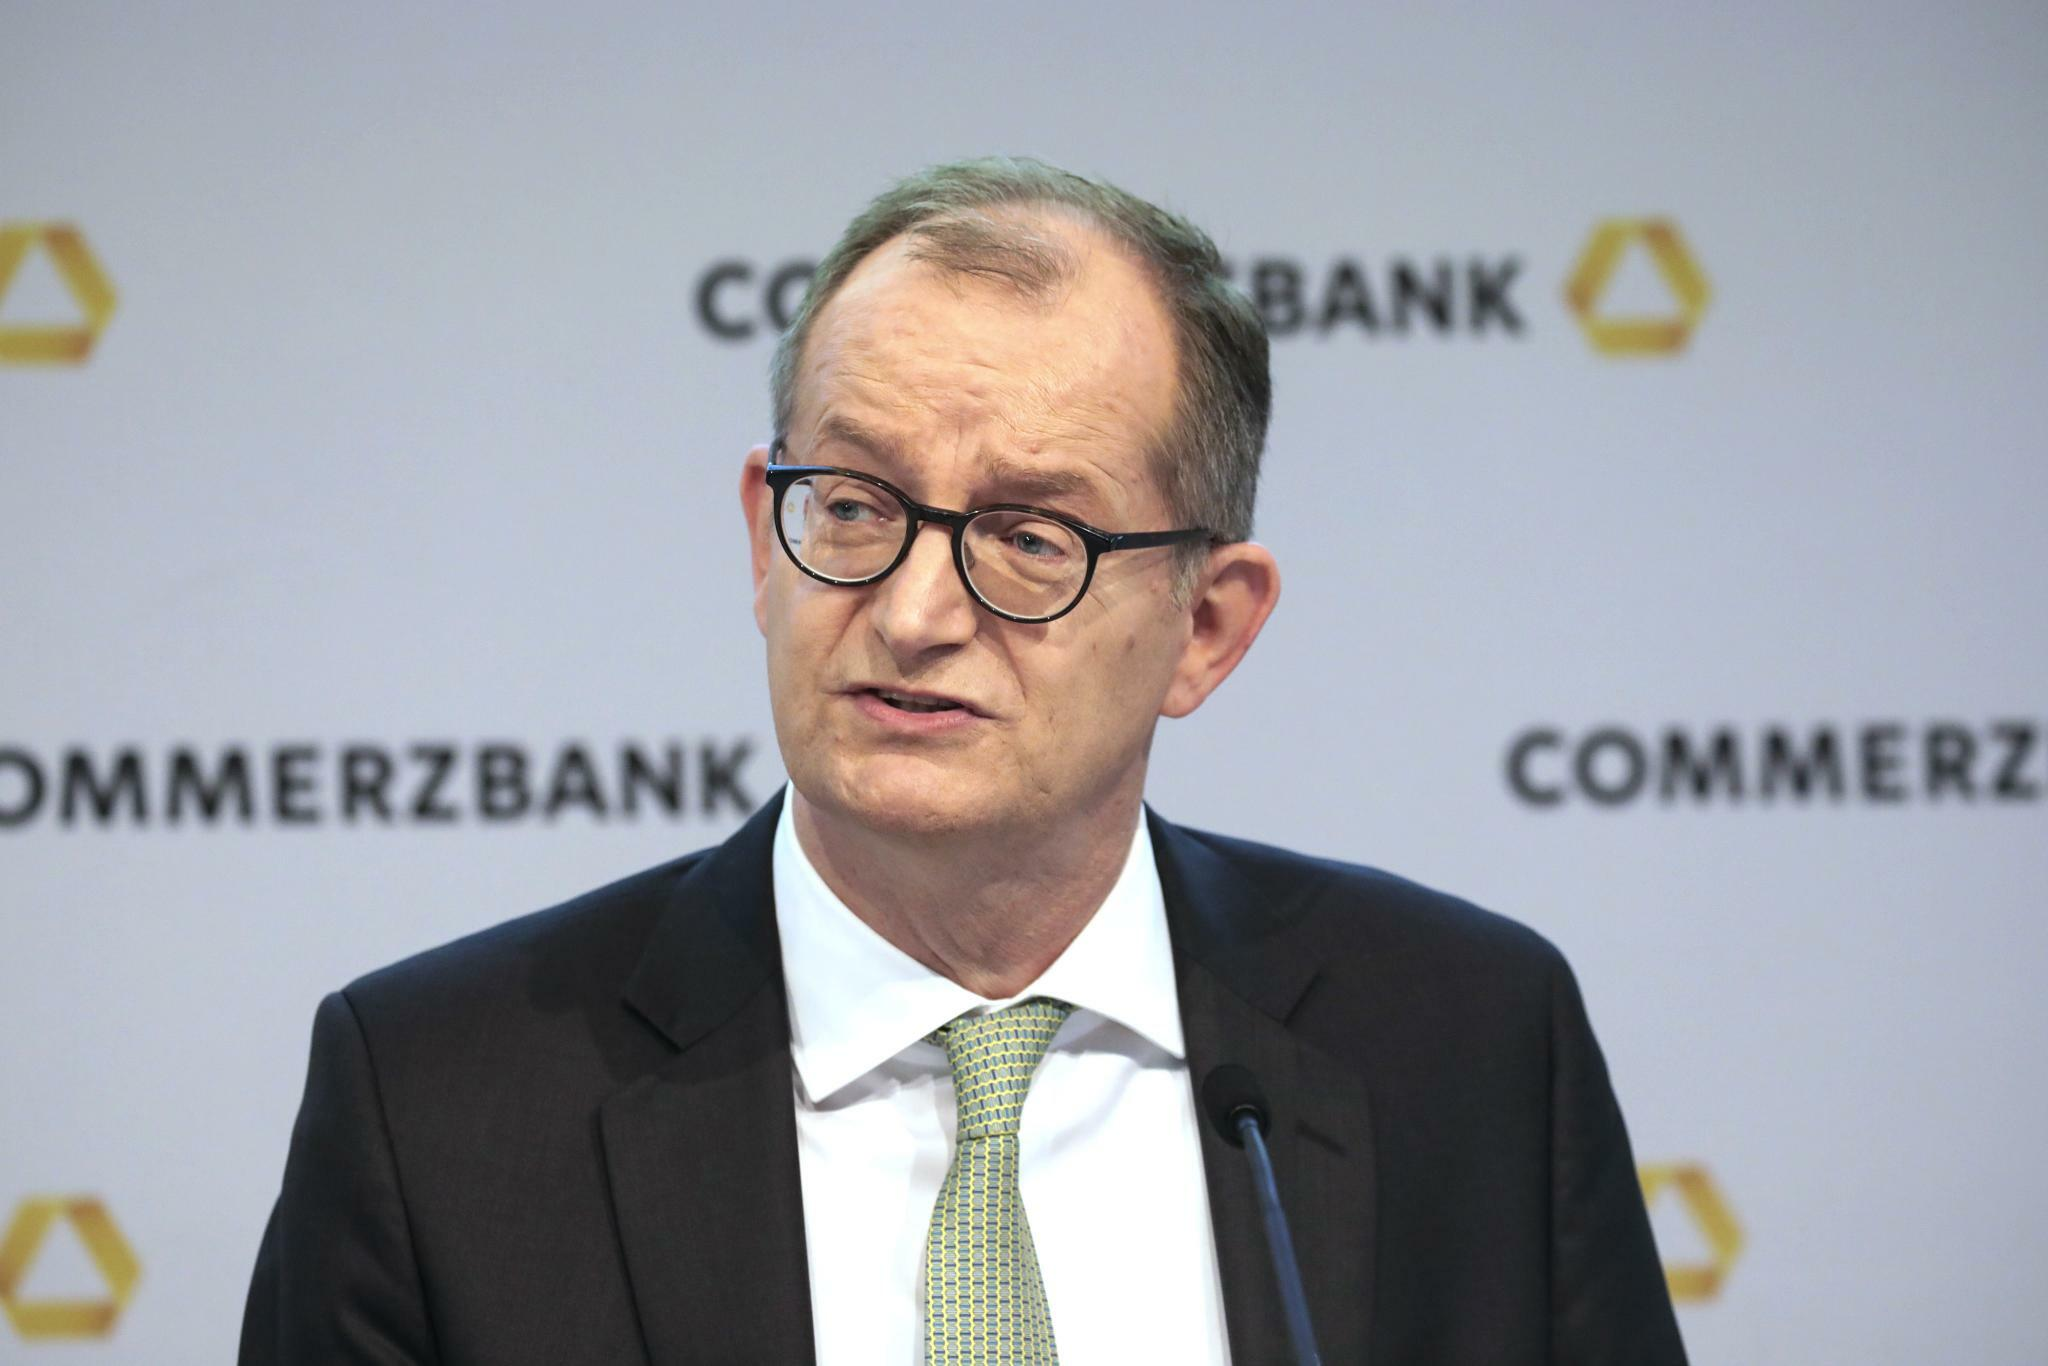 Commerzbank: Strategiewechsel bringt Martin Zielke in Zwickmühle